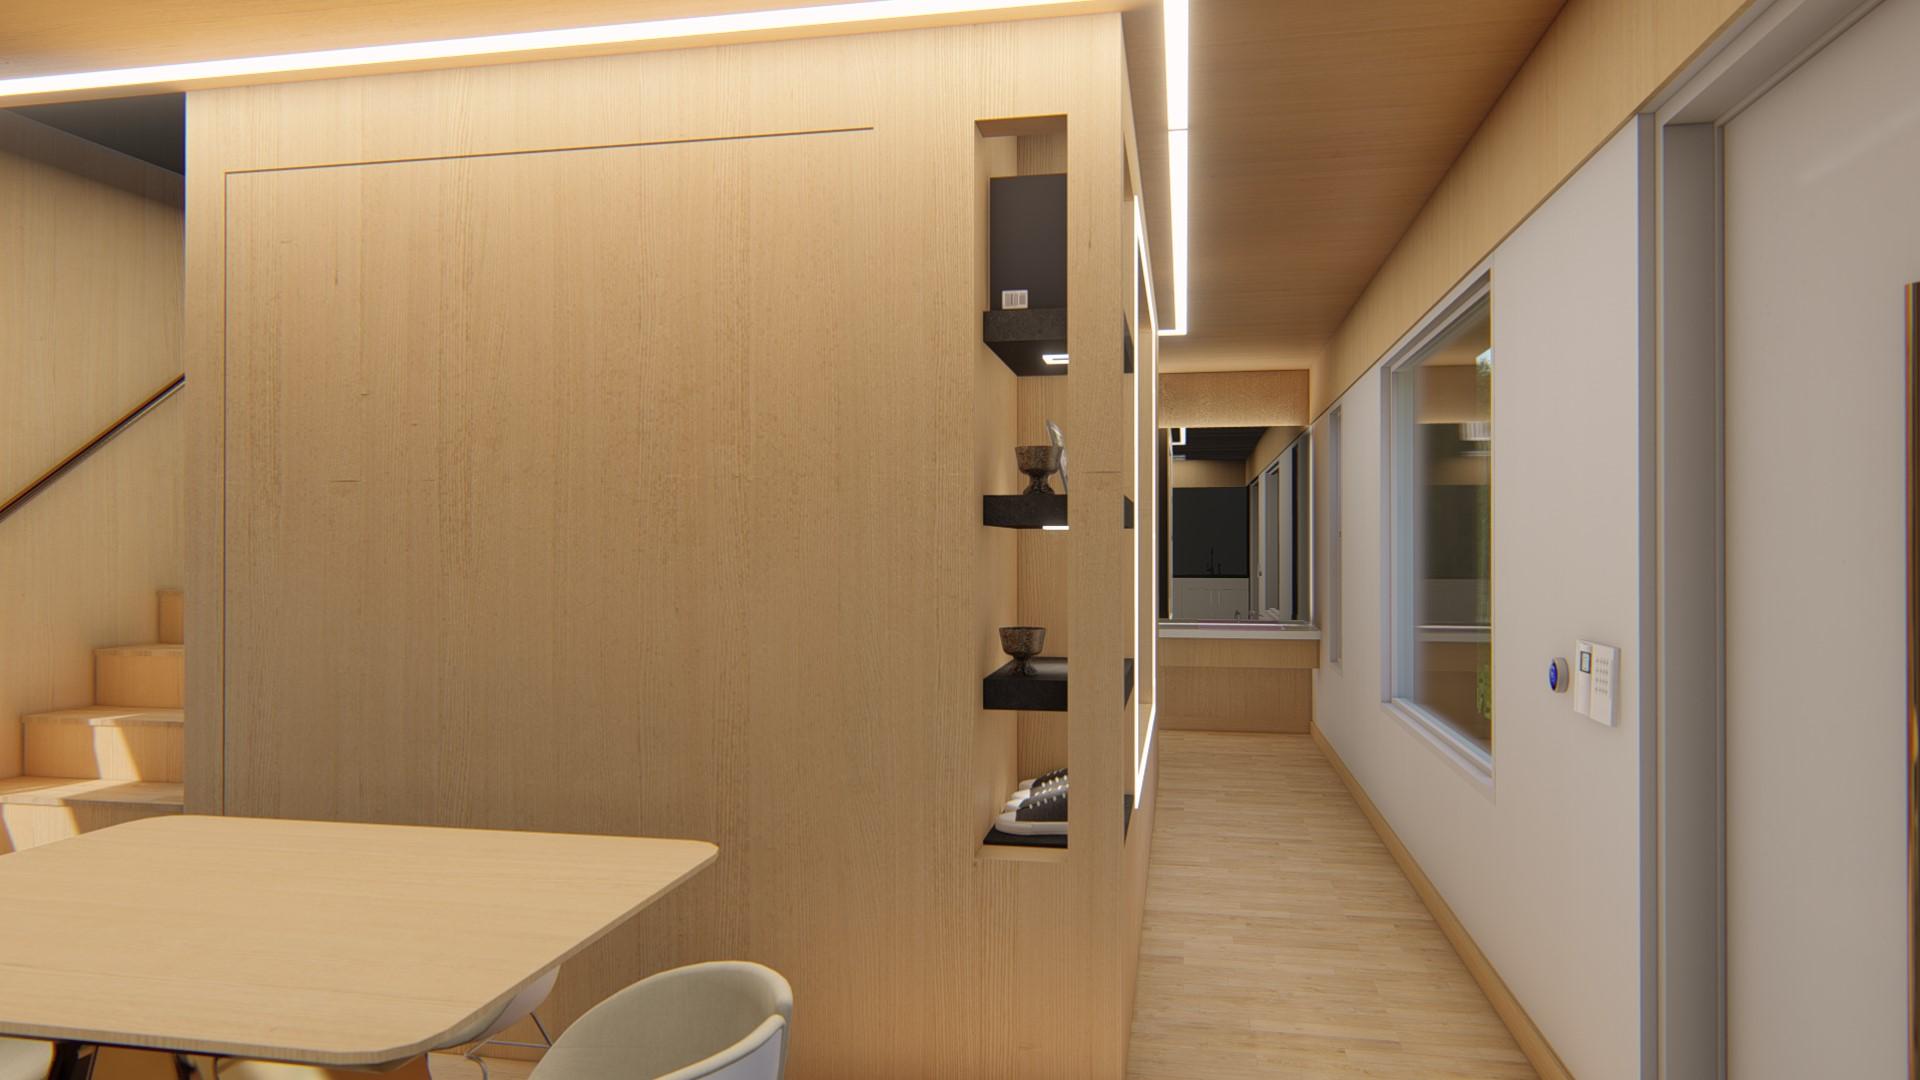 Ghuman - Interior_Scheme D_Photo - 2.jpg